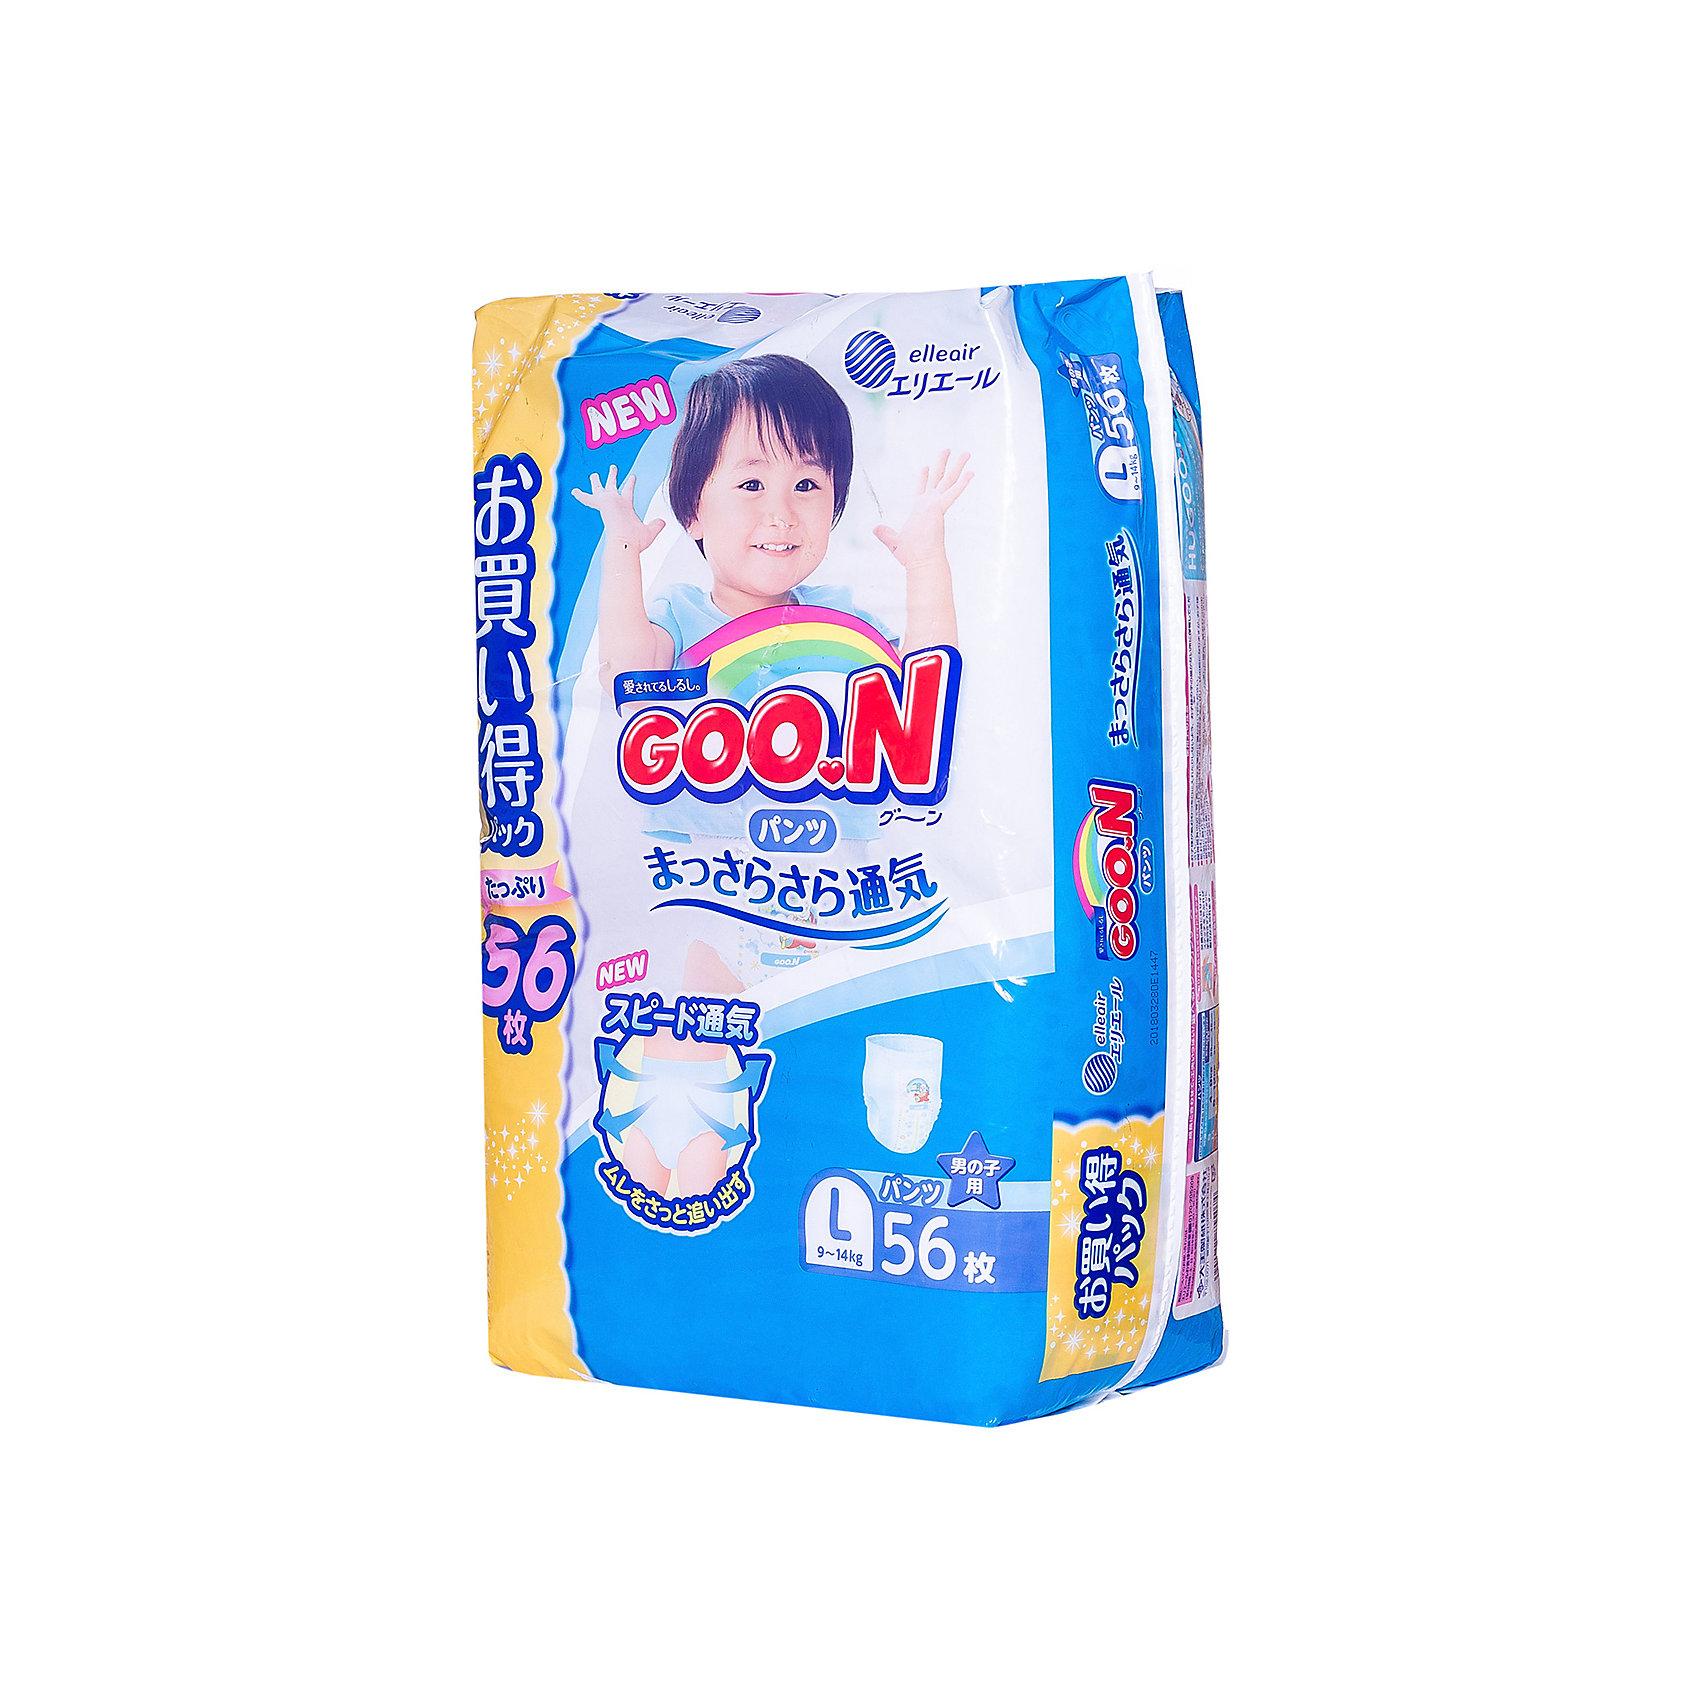 Подгузники-трусики для девочек ULTRA JUMBO PACK,  L 9-14 кг., 56 шт., Goon